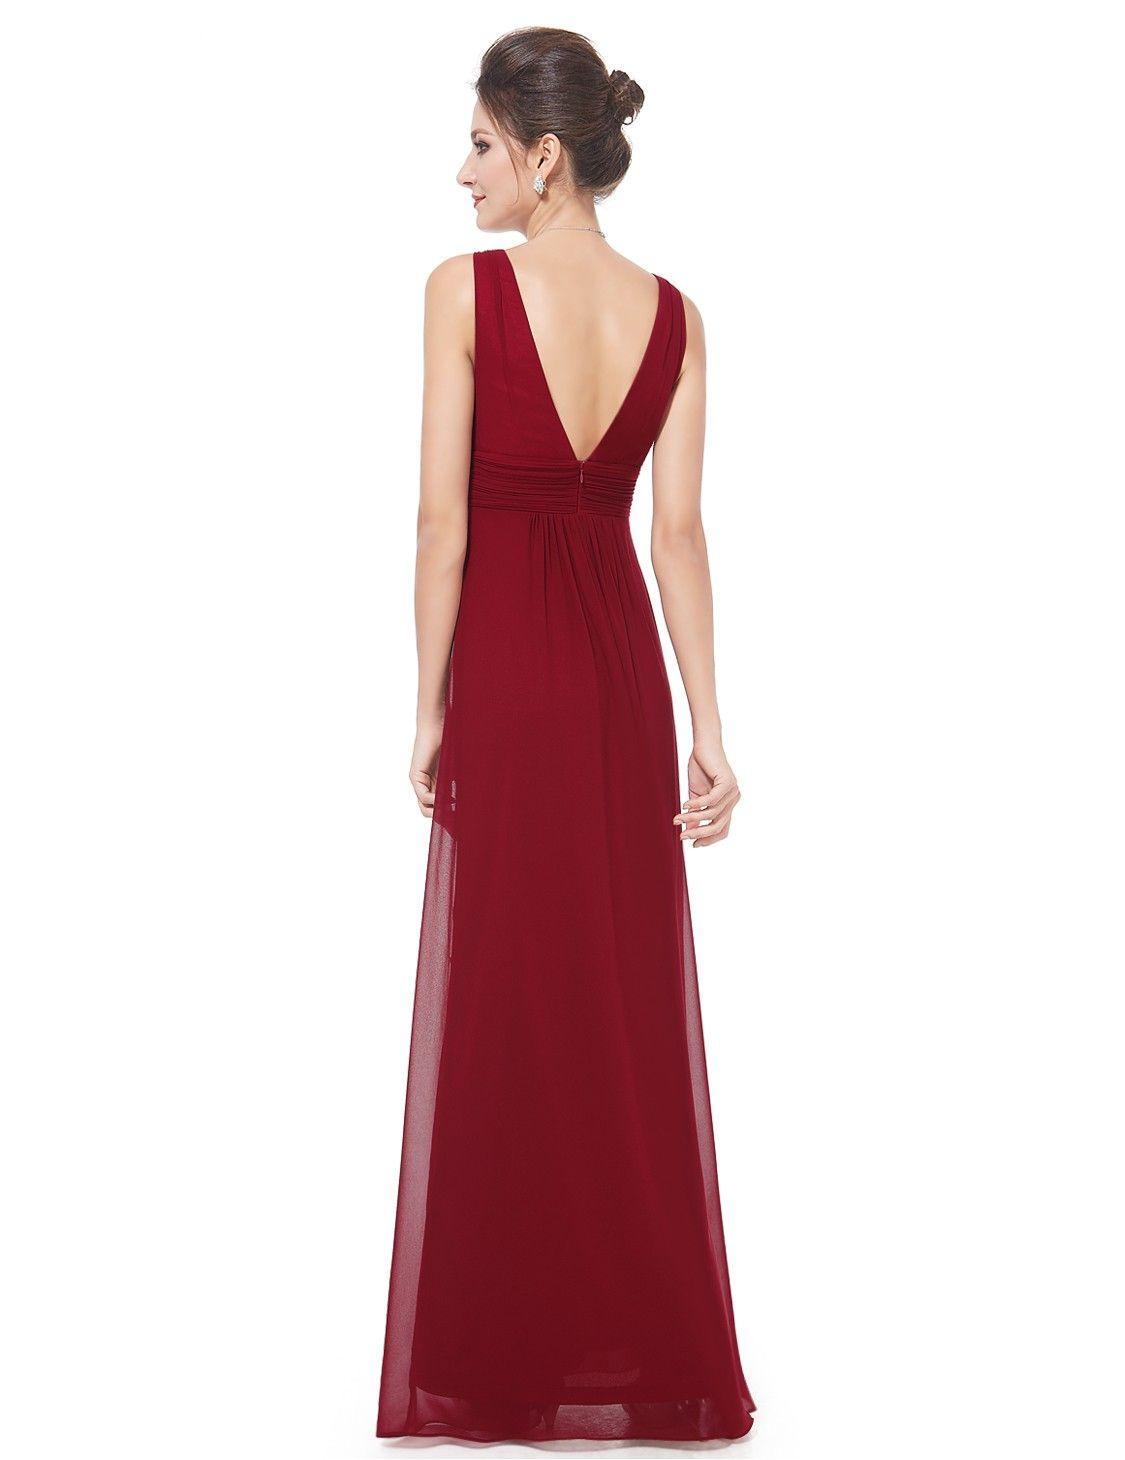 Sleeveless V-Neck Semi-Formal Maxi Dress   Ever-Pretty ...